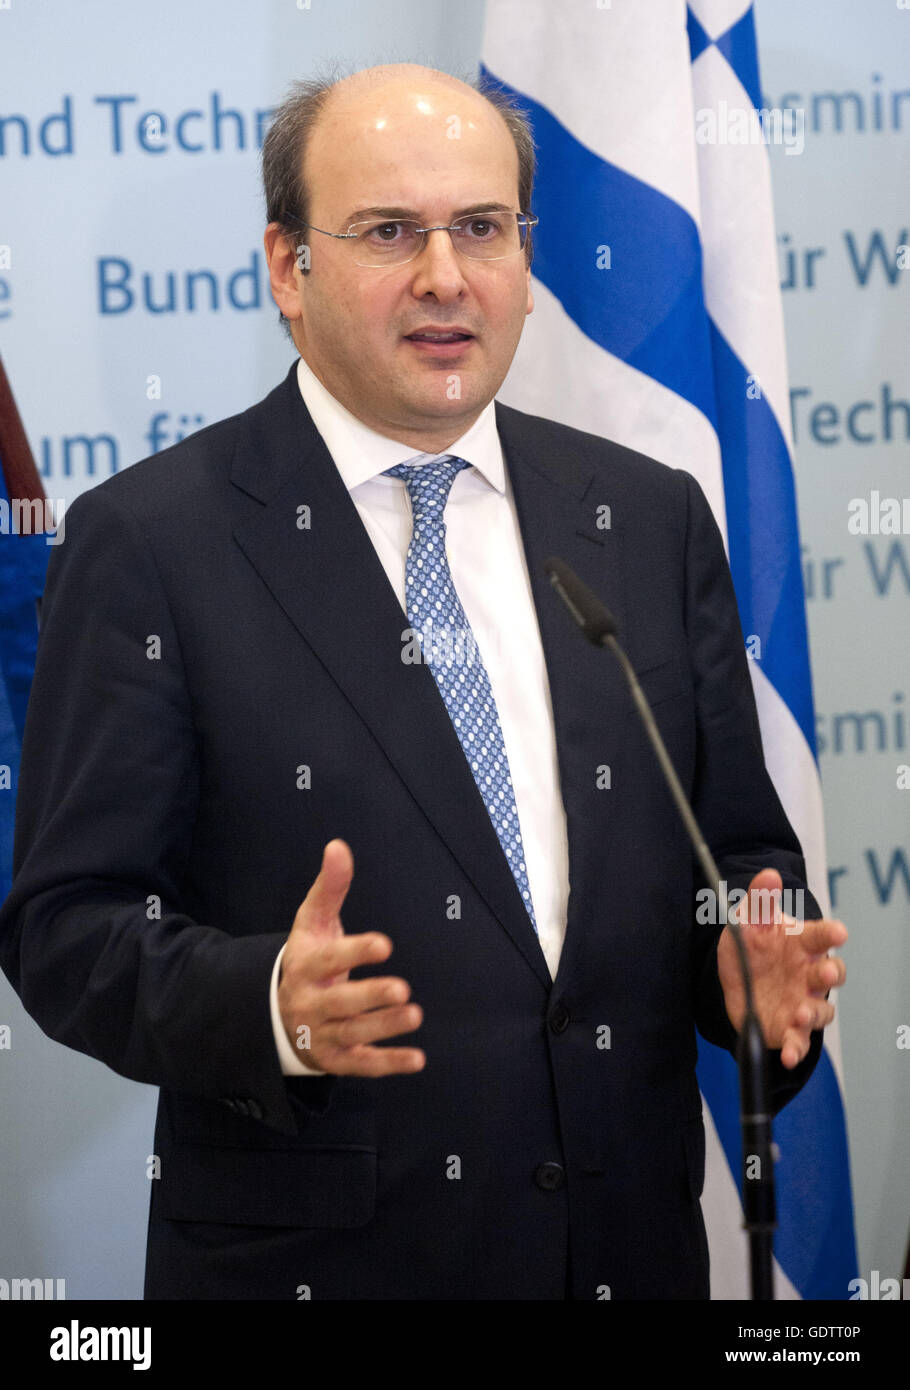 Konstantinos Chatzidakis - Stock Image